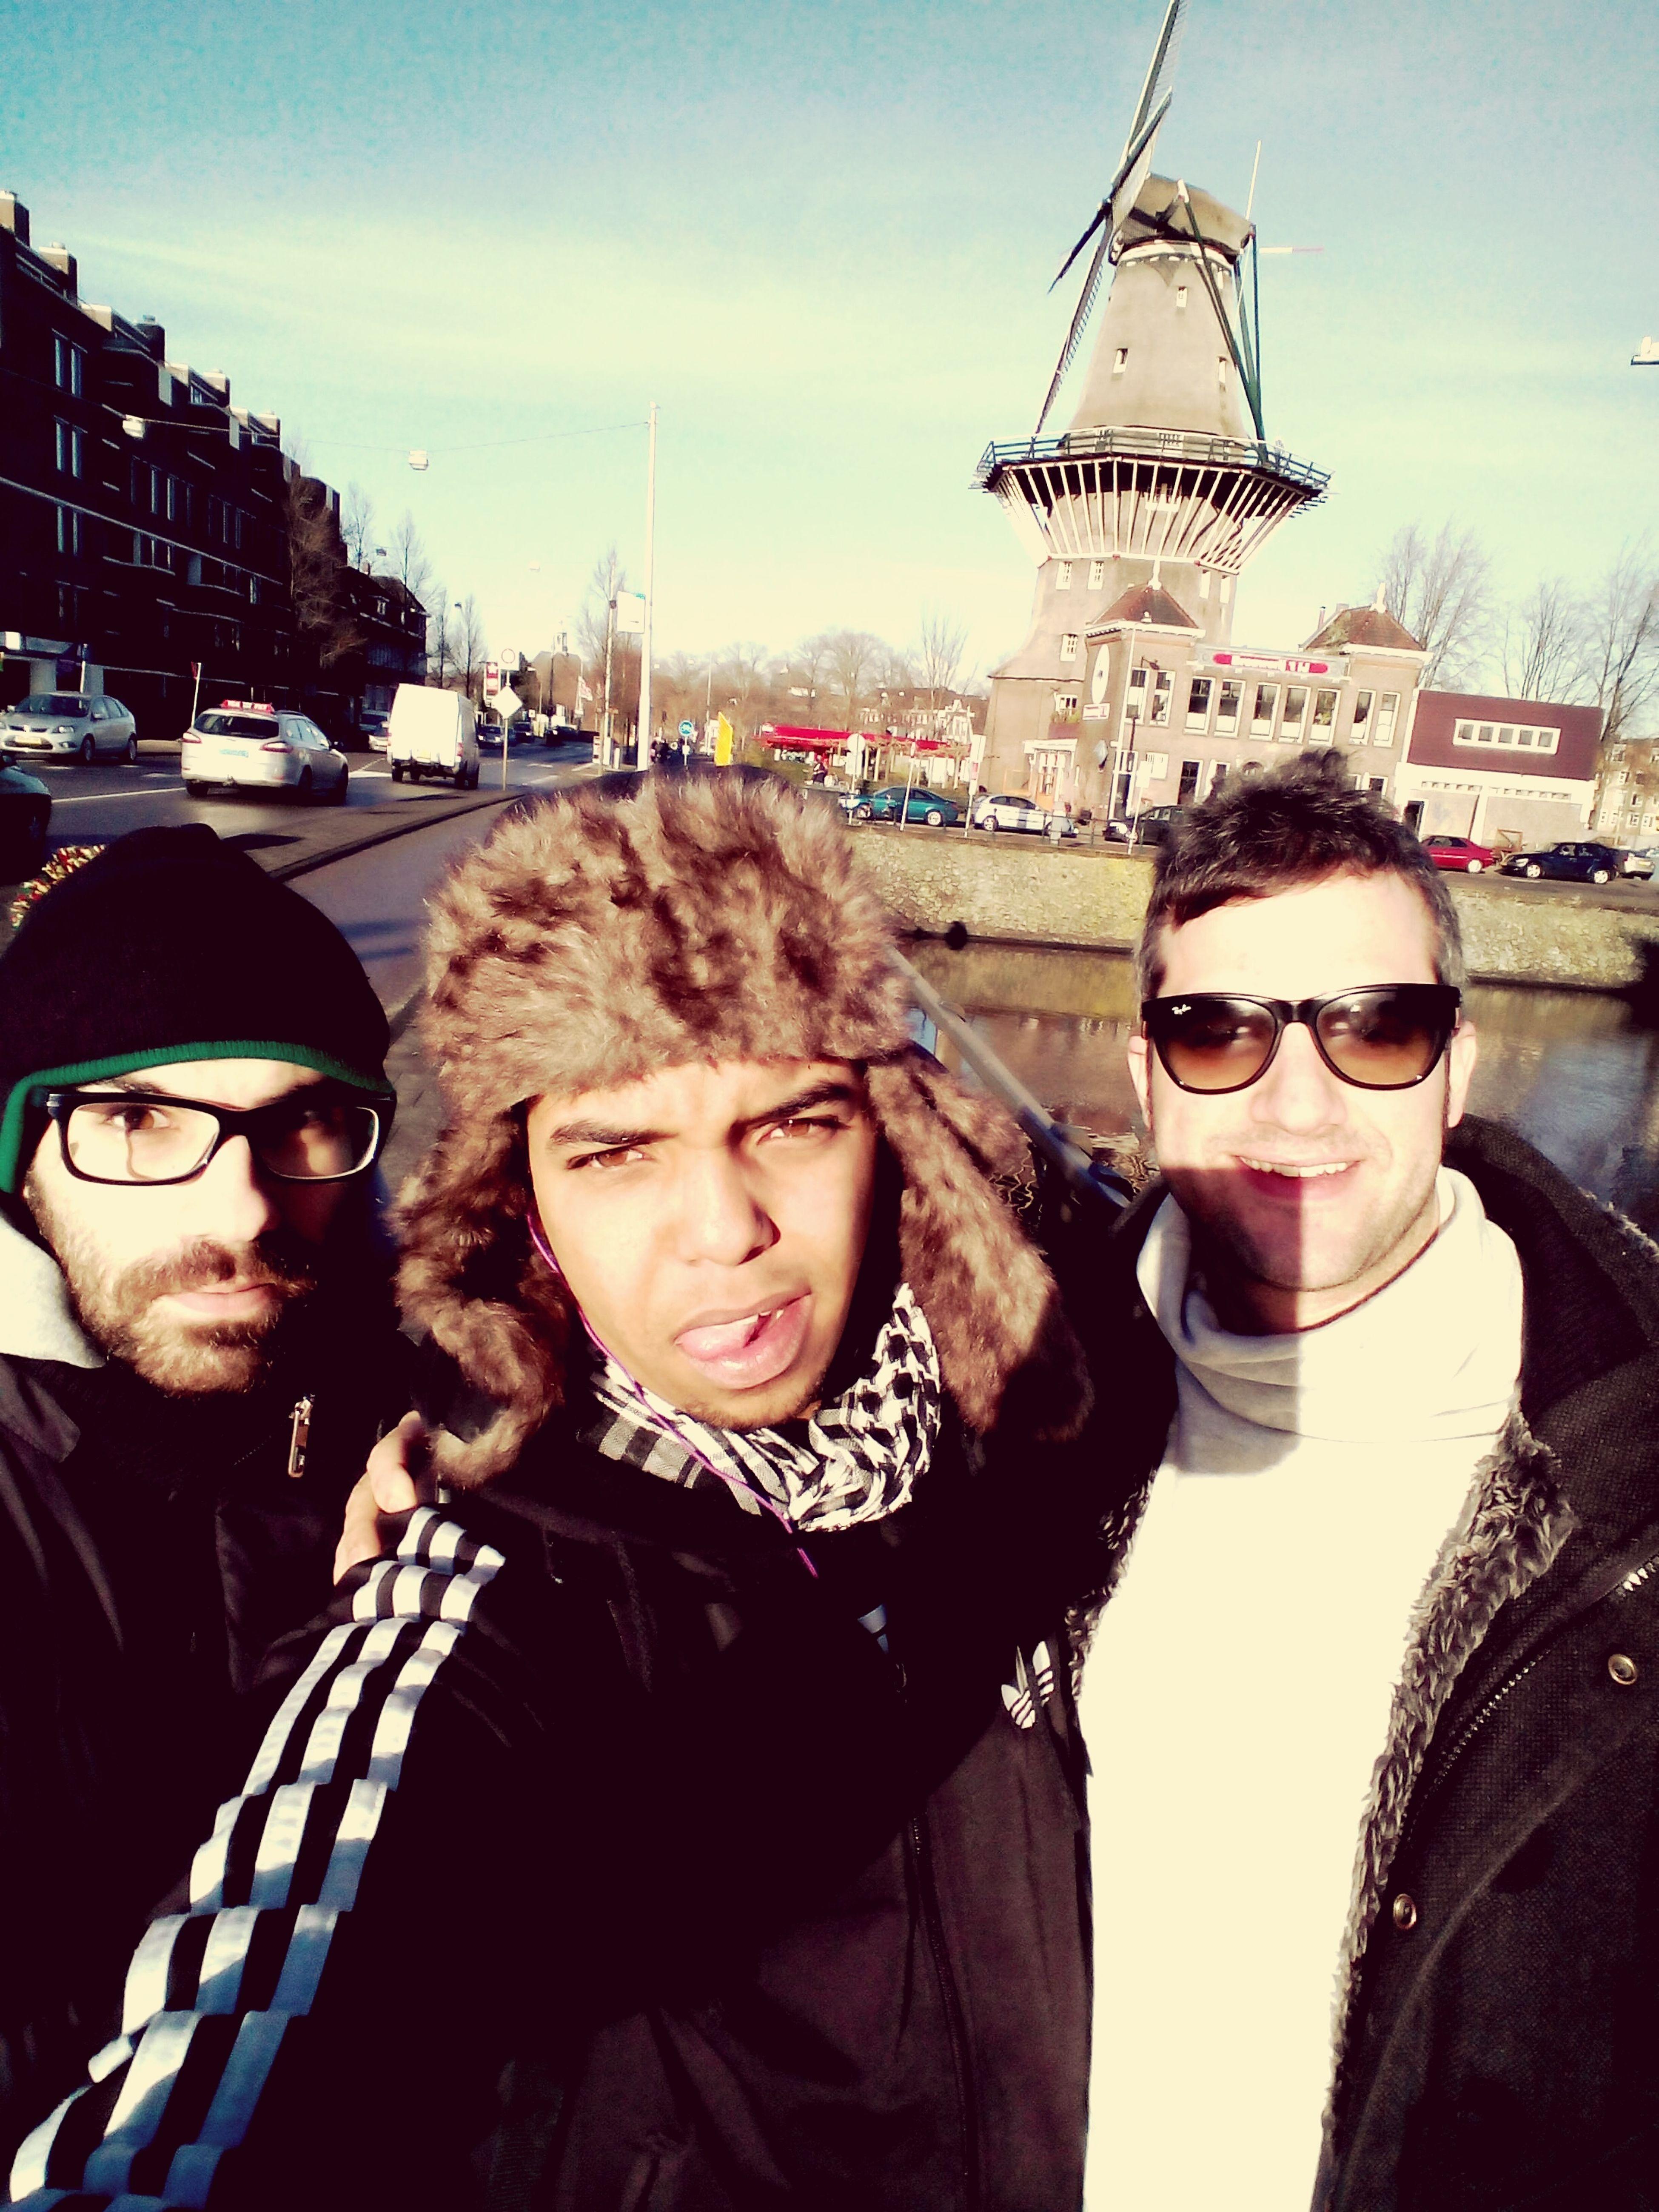 Amsterdam Hello World